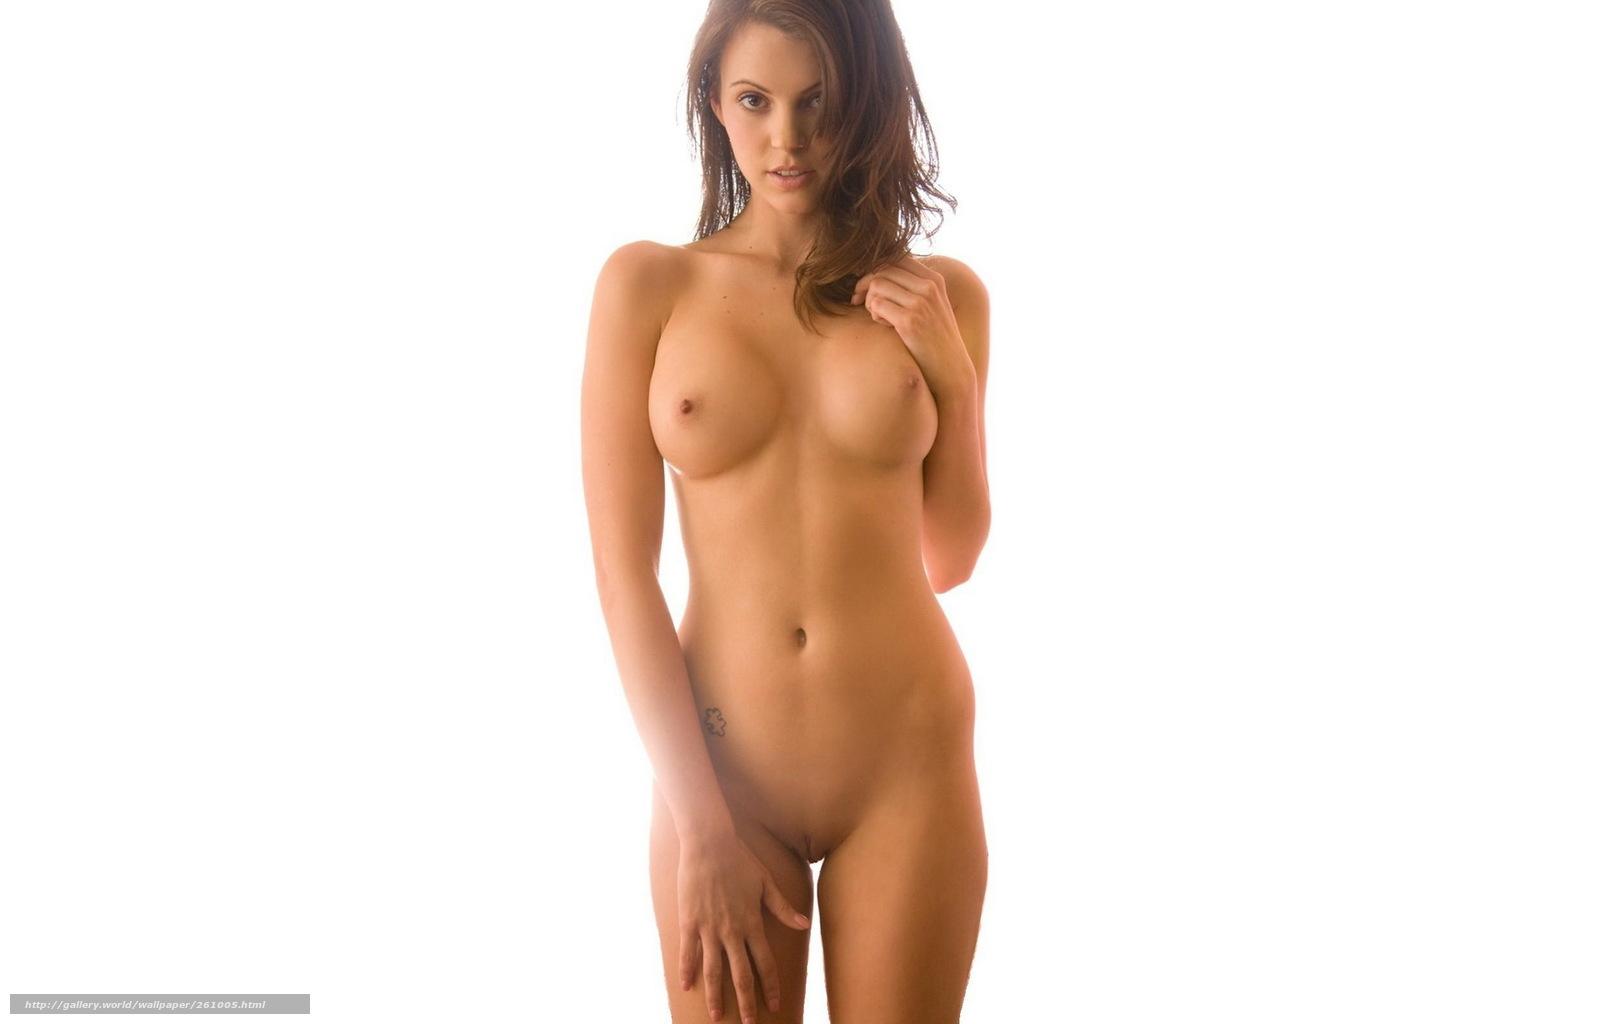 девушка, сексуальная, обнаженная, голая, фигура, грудь, супер ...